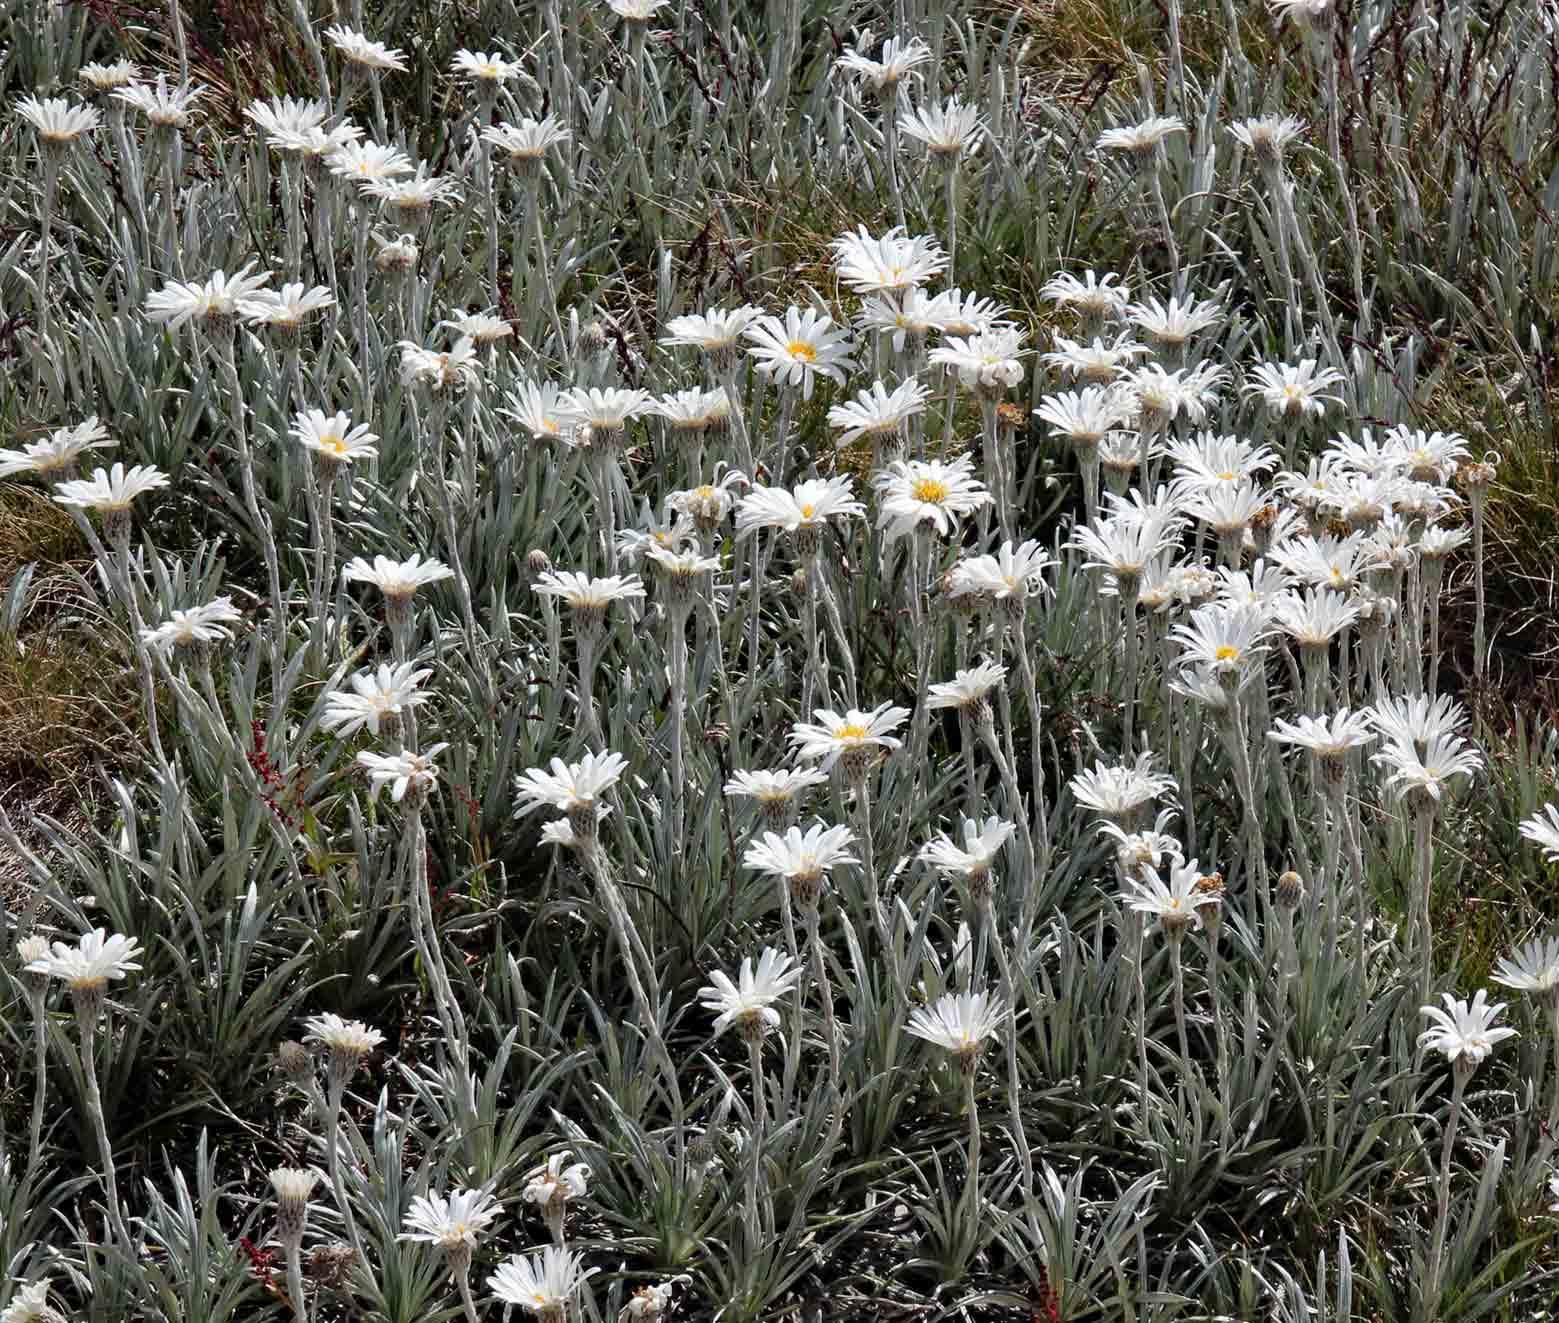 Australian flowers kosciuszko national park snowy mountains australian flowers kosciuszko national park snowy mountains australia mightylinksfo